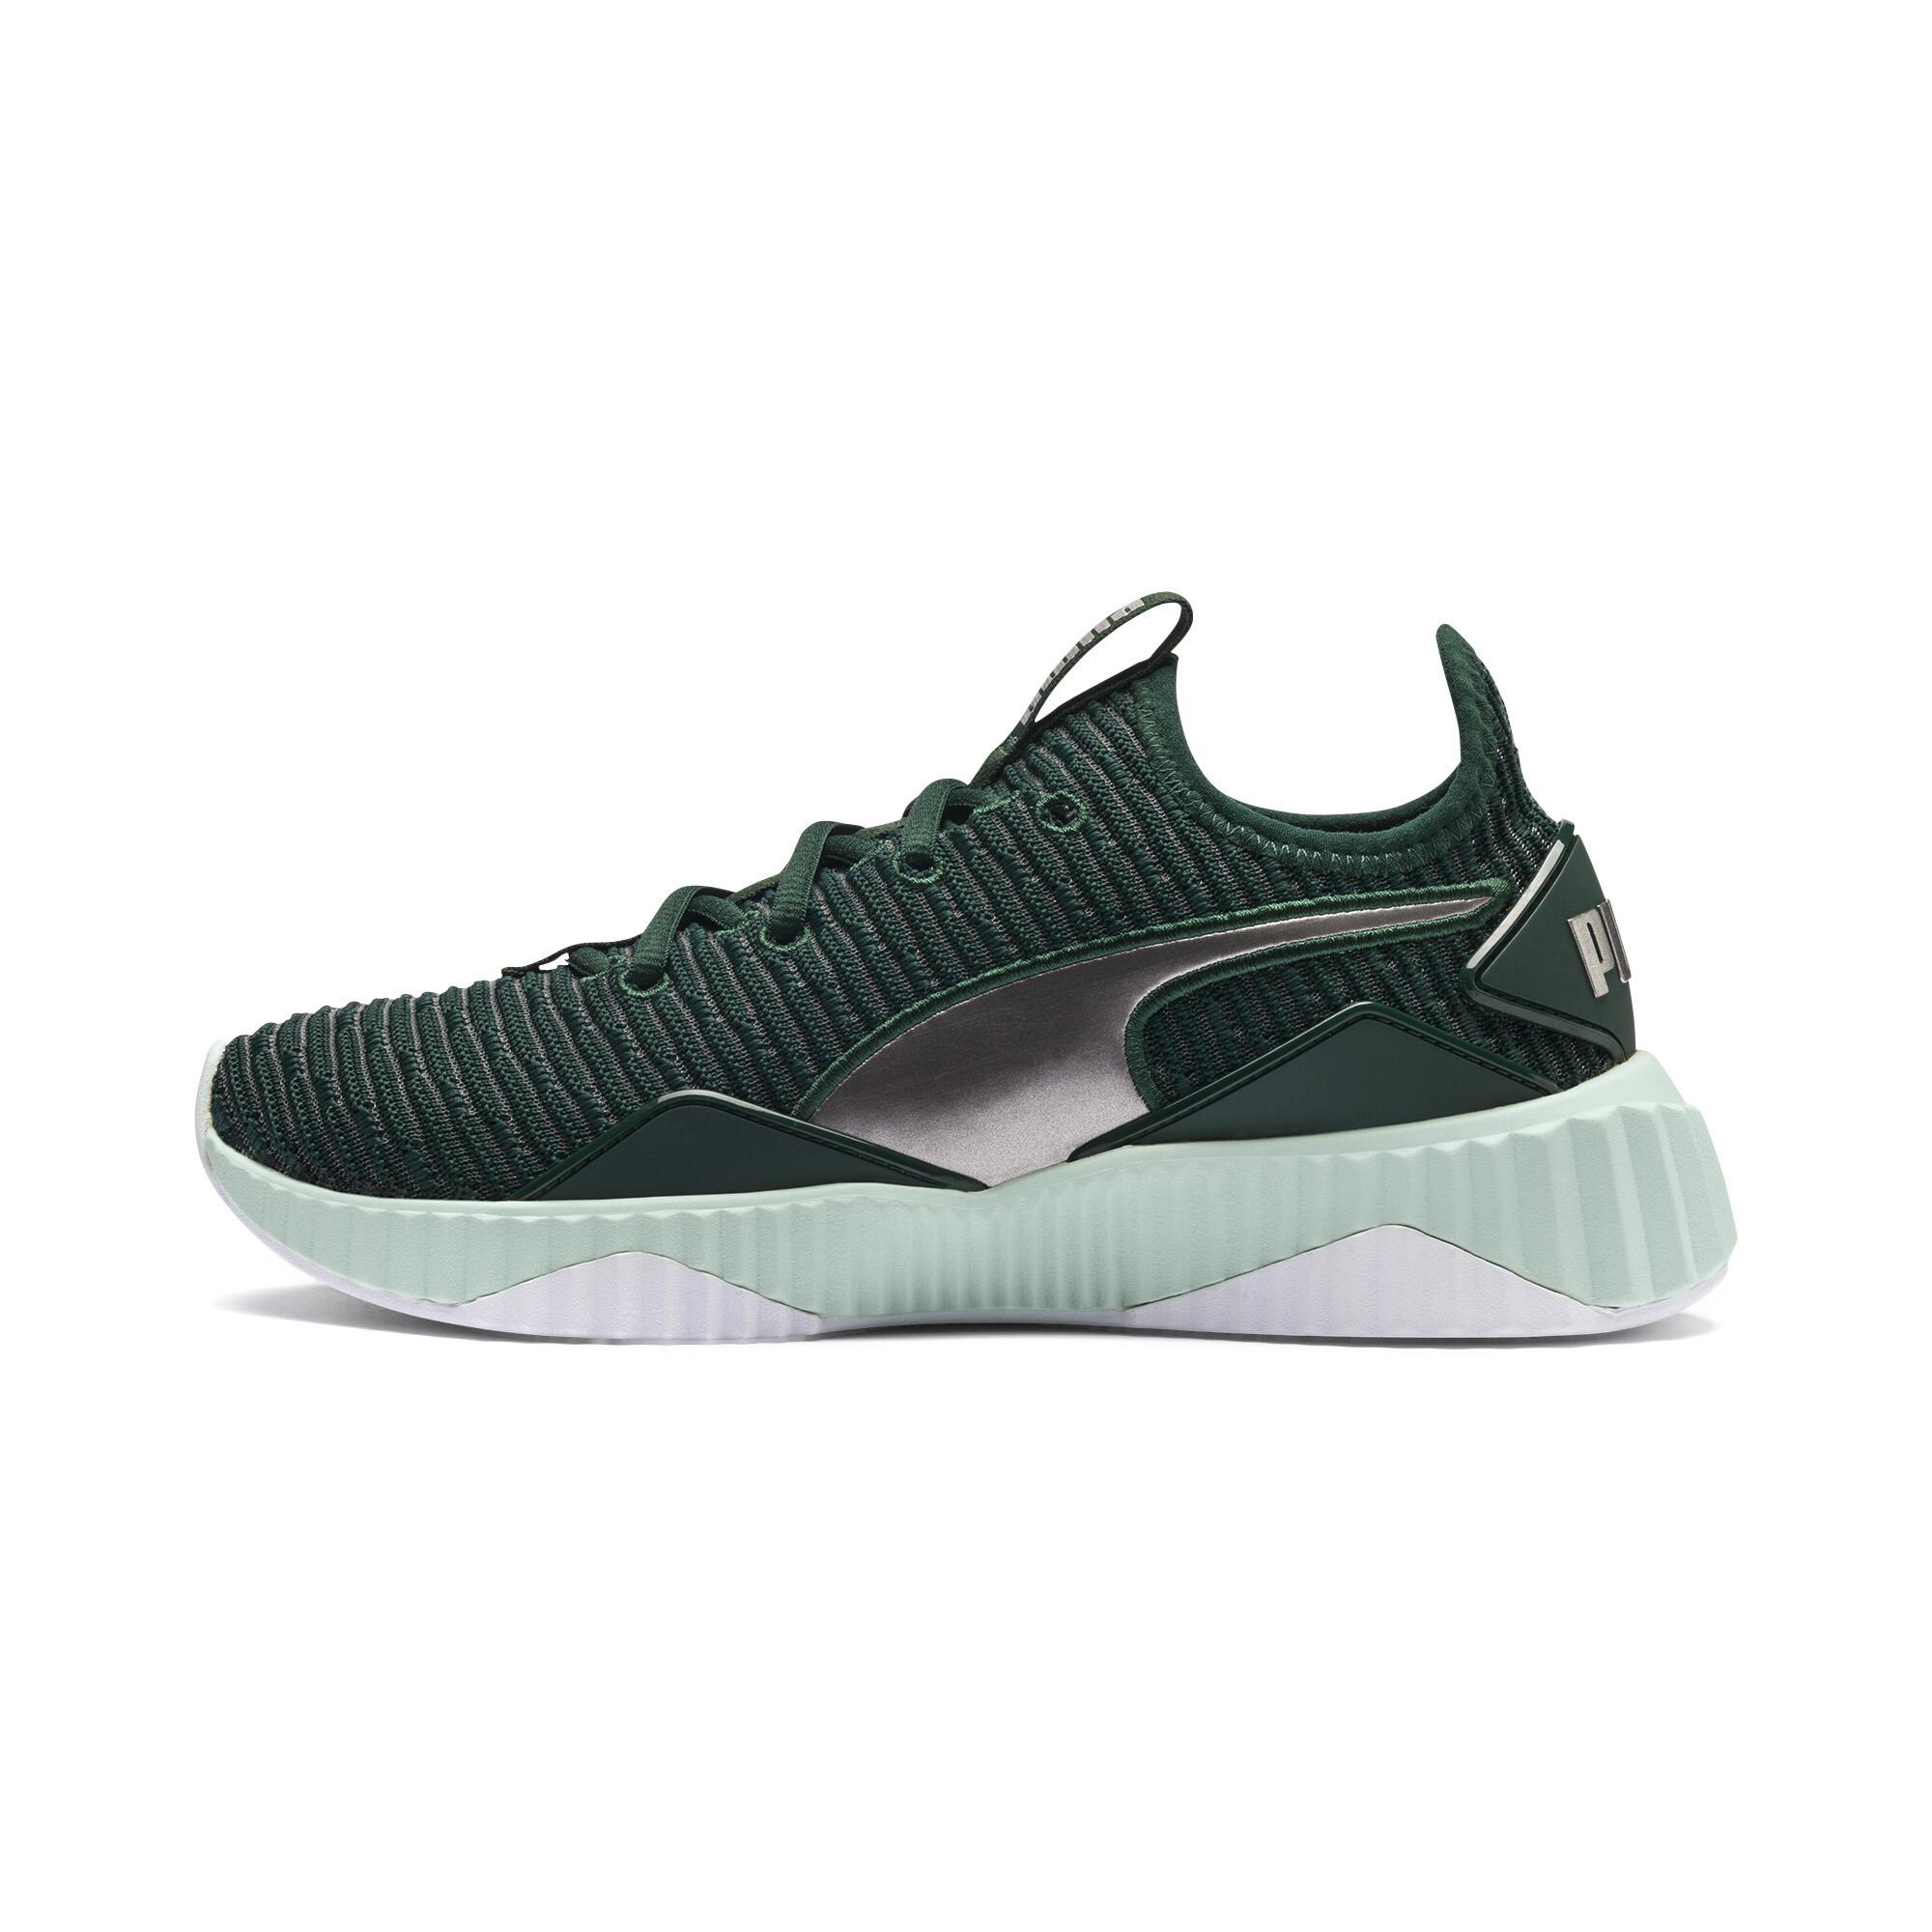 Image Puma Defy Trailblazer Women's Sneakers #1